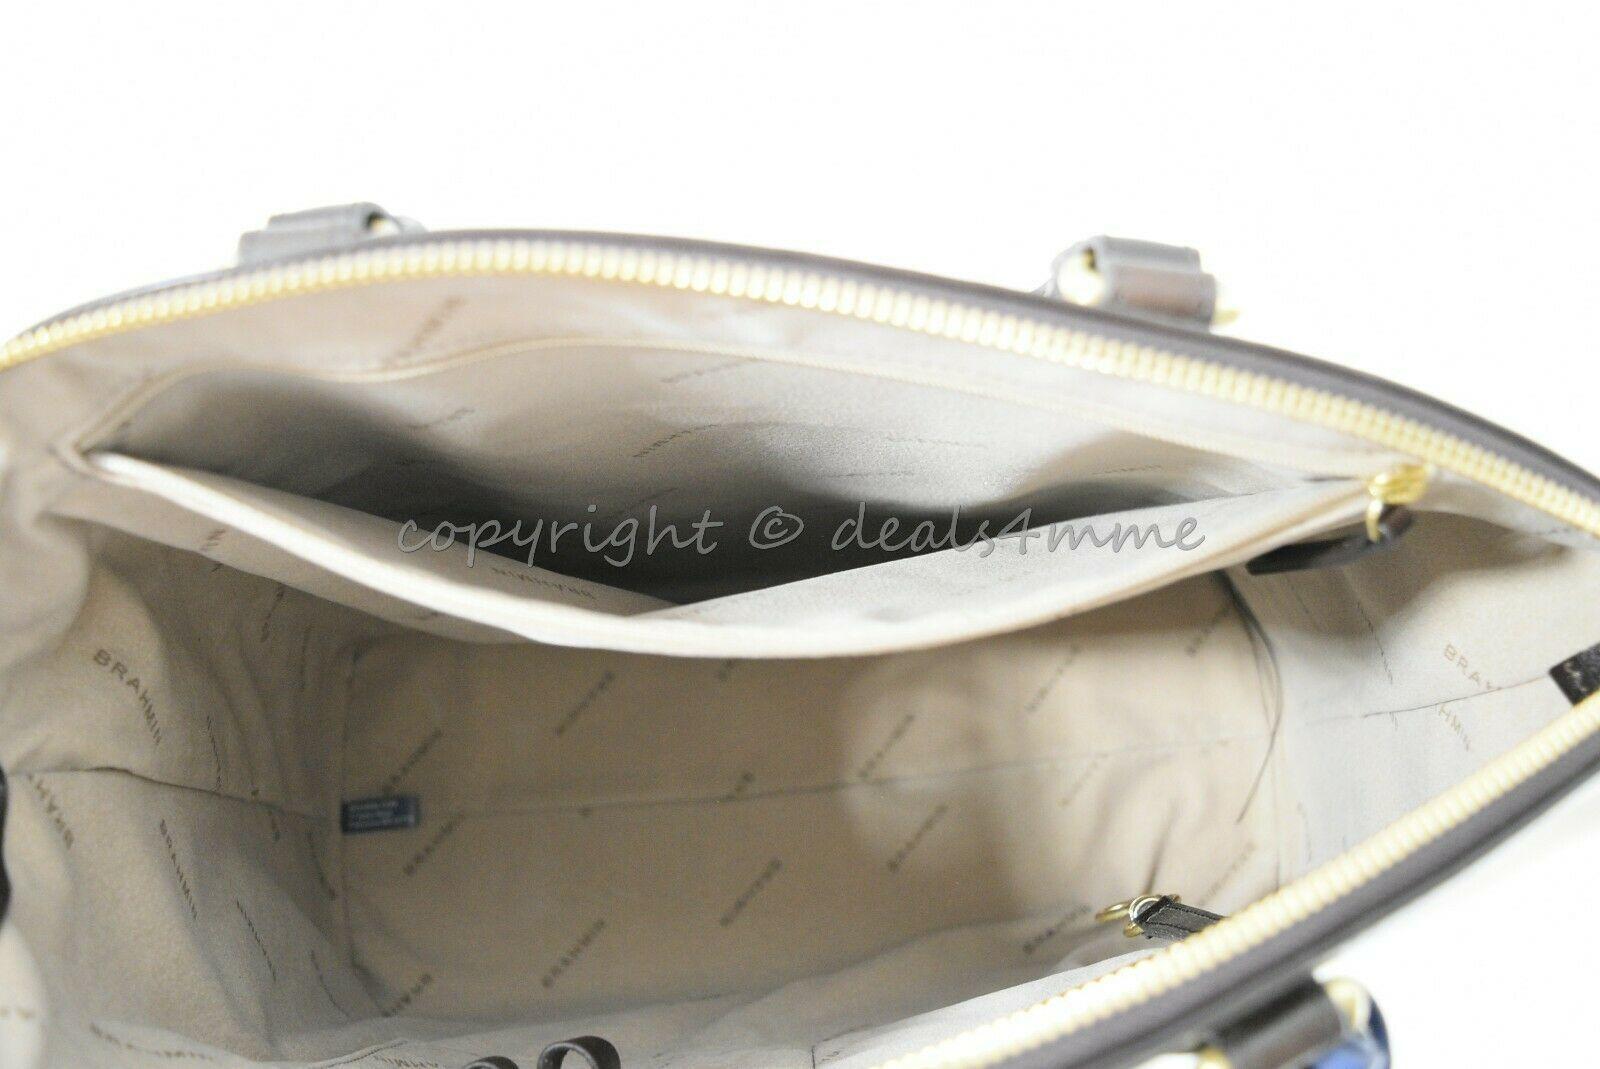 NWT Brahmin Large Duxbury Smooth Leather Satchel/Shoulder Bag in Sand Westport image 12